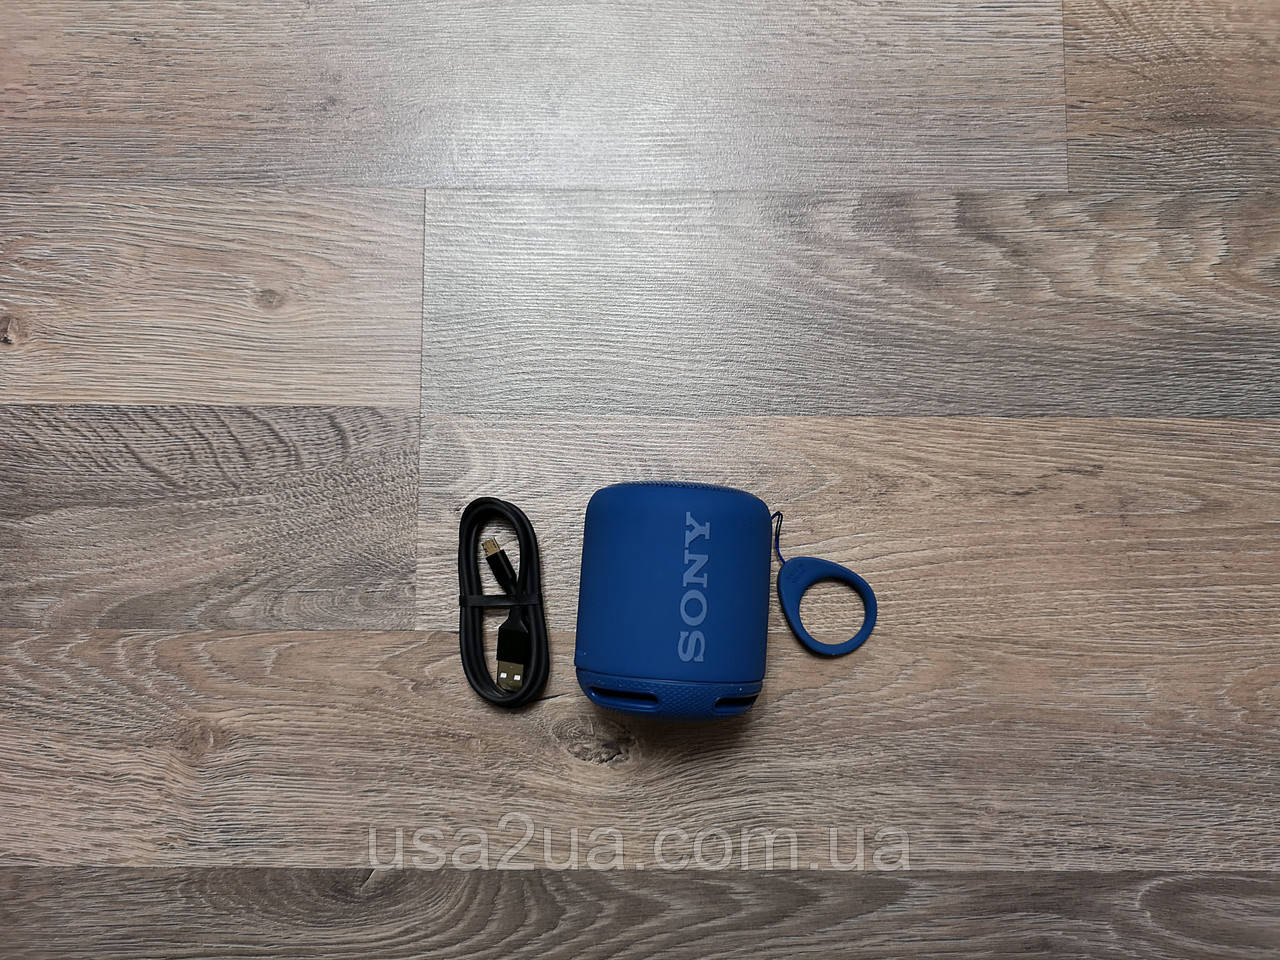 Портативная Колонка Bluetooth SONY SRS-XB10 BLUE